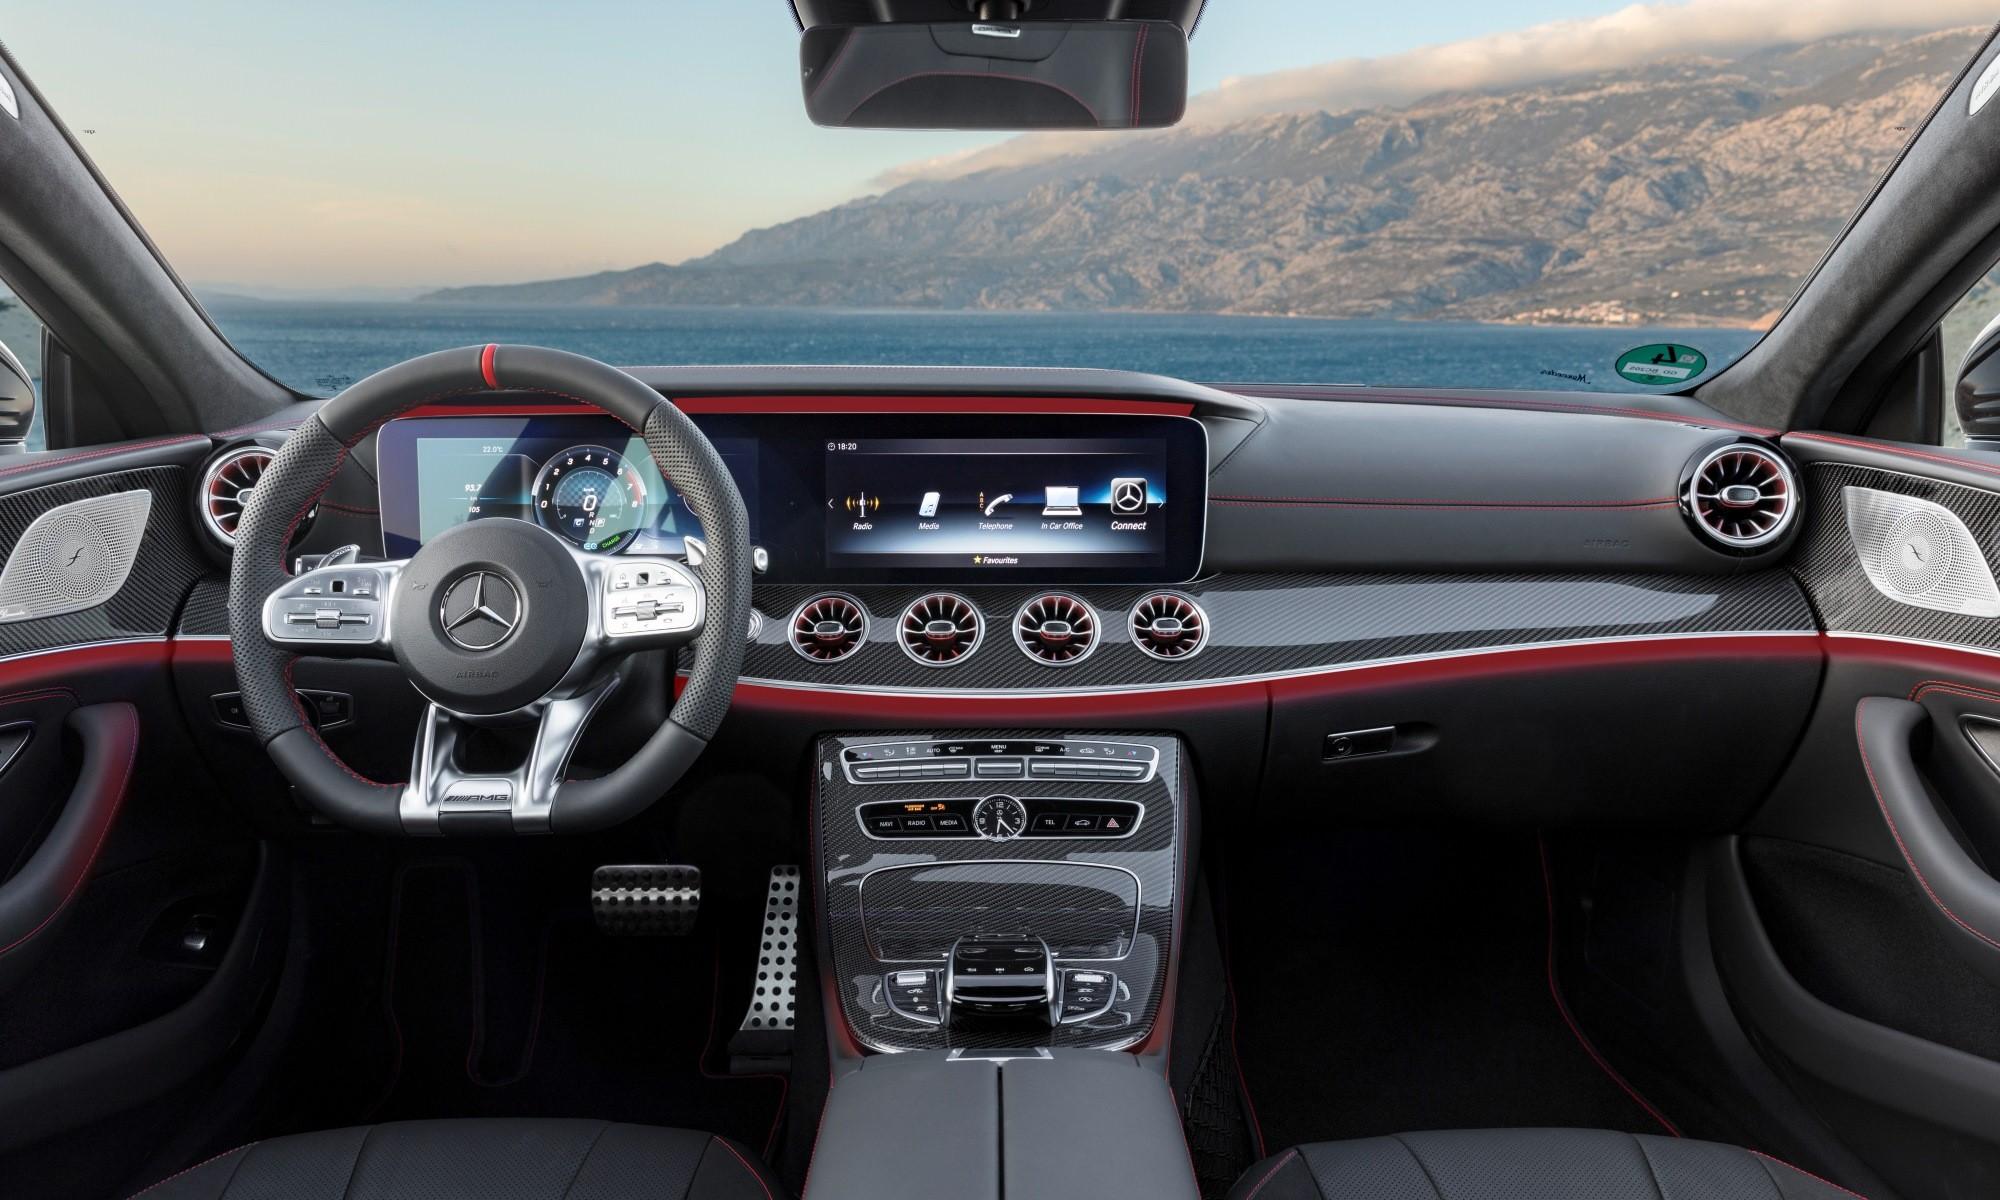 Mercedes-AMG CLS53 interior